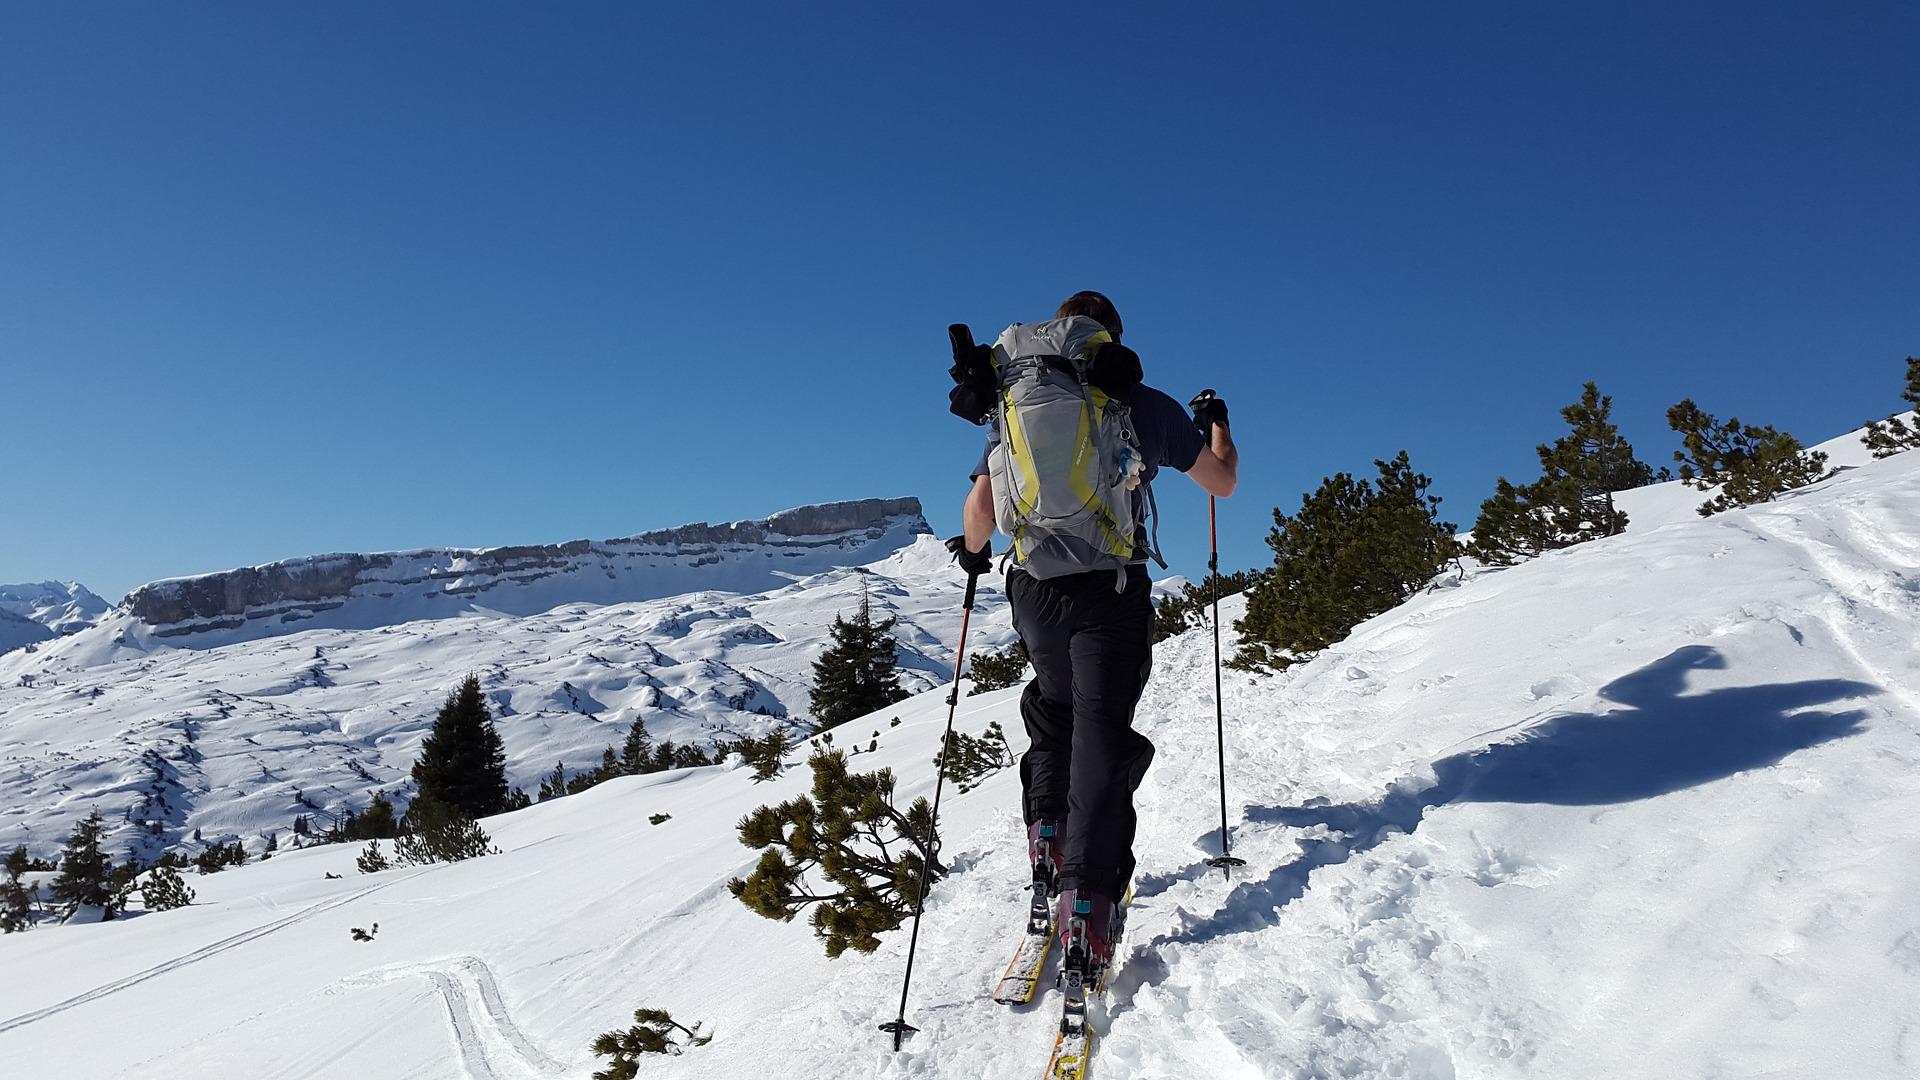 backcountry-skiiing-635974_1920.jpg